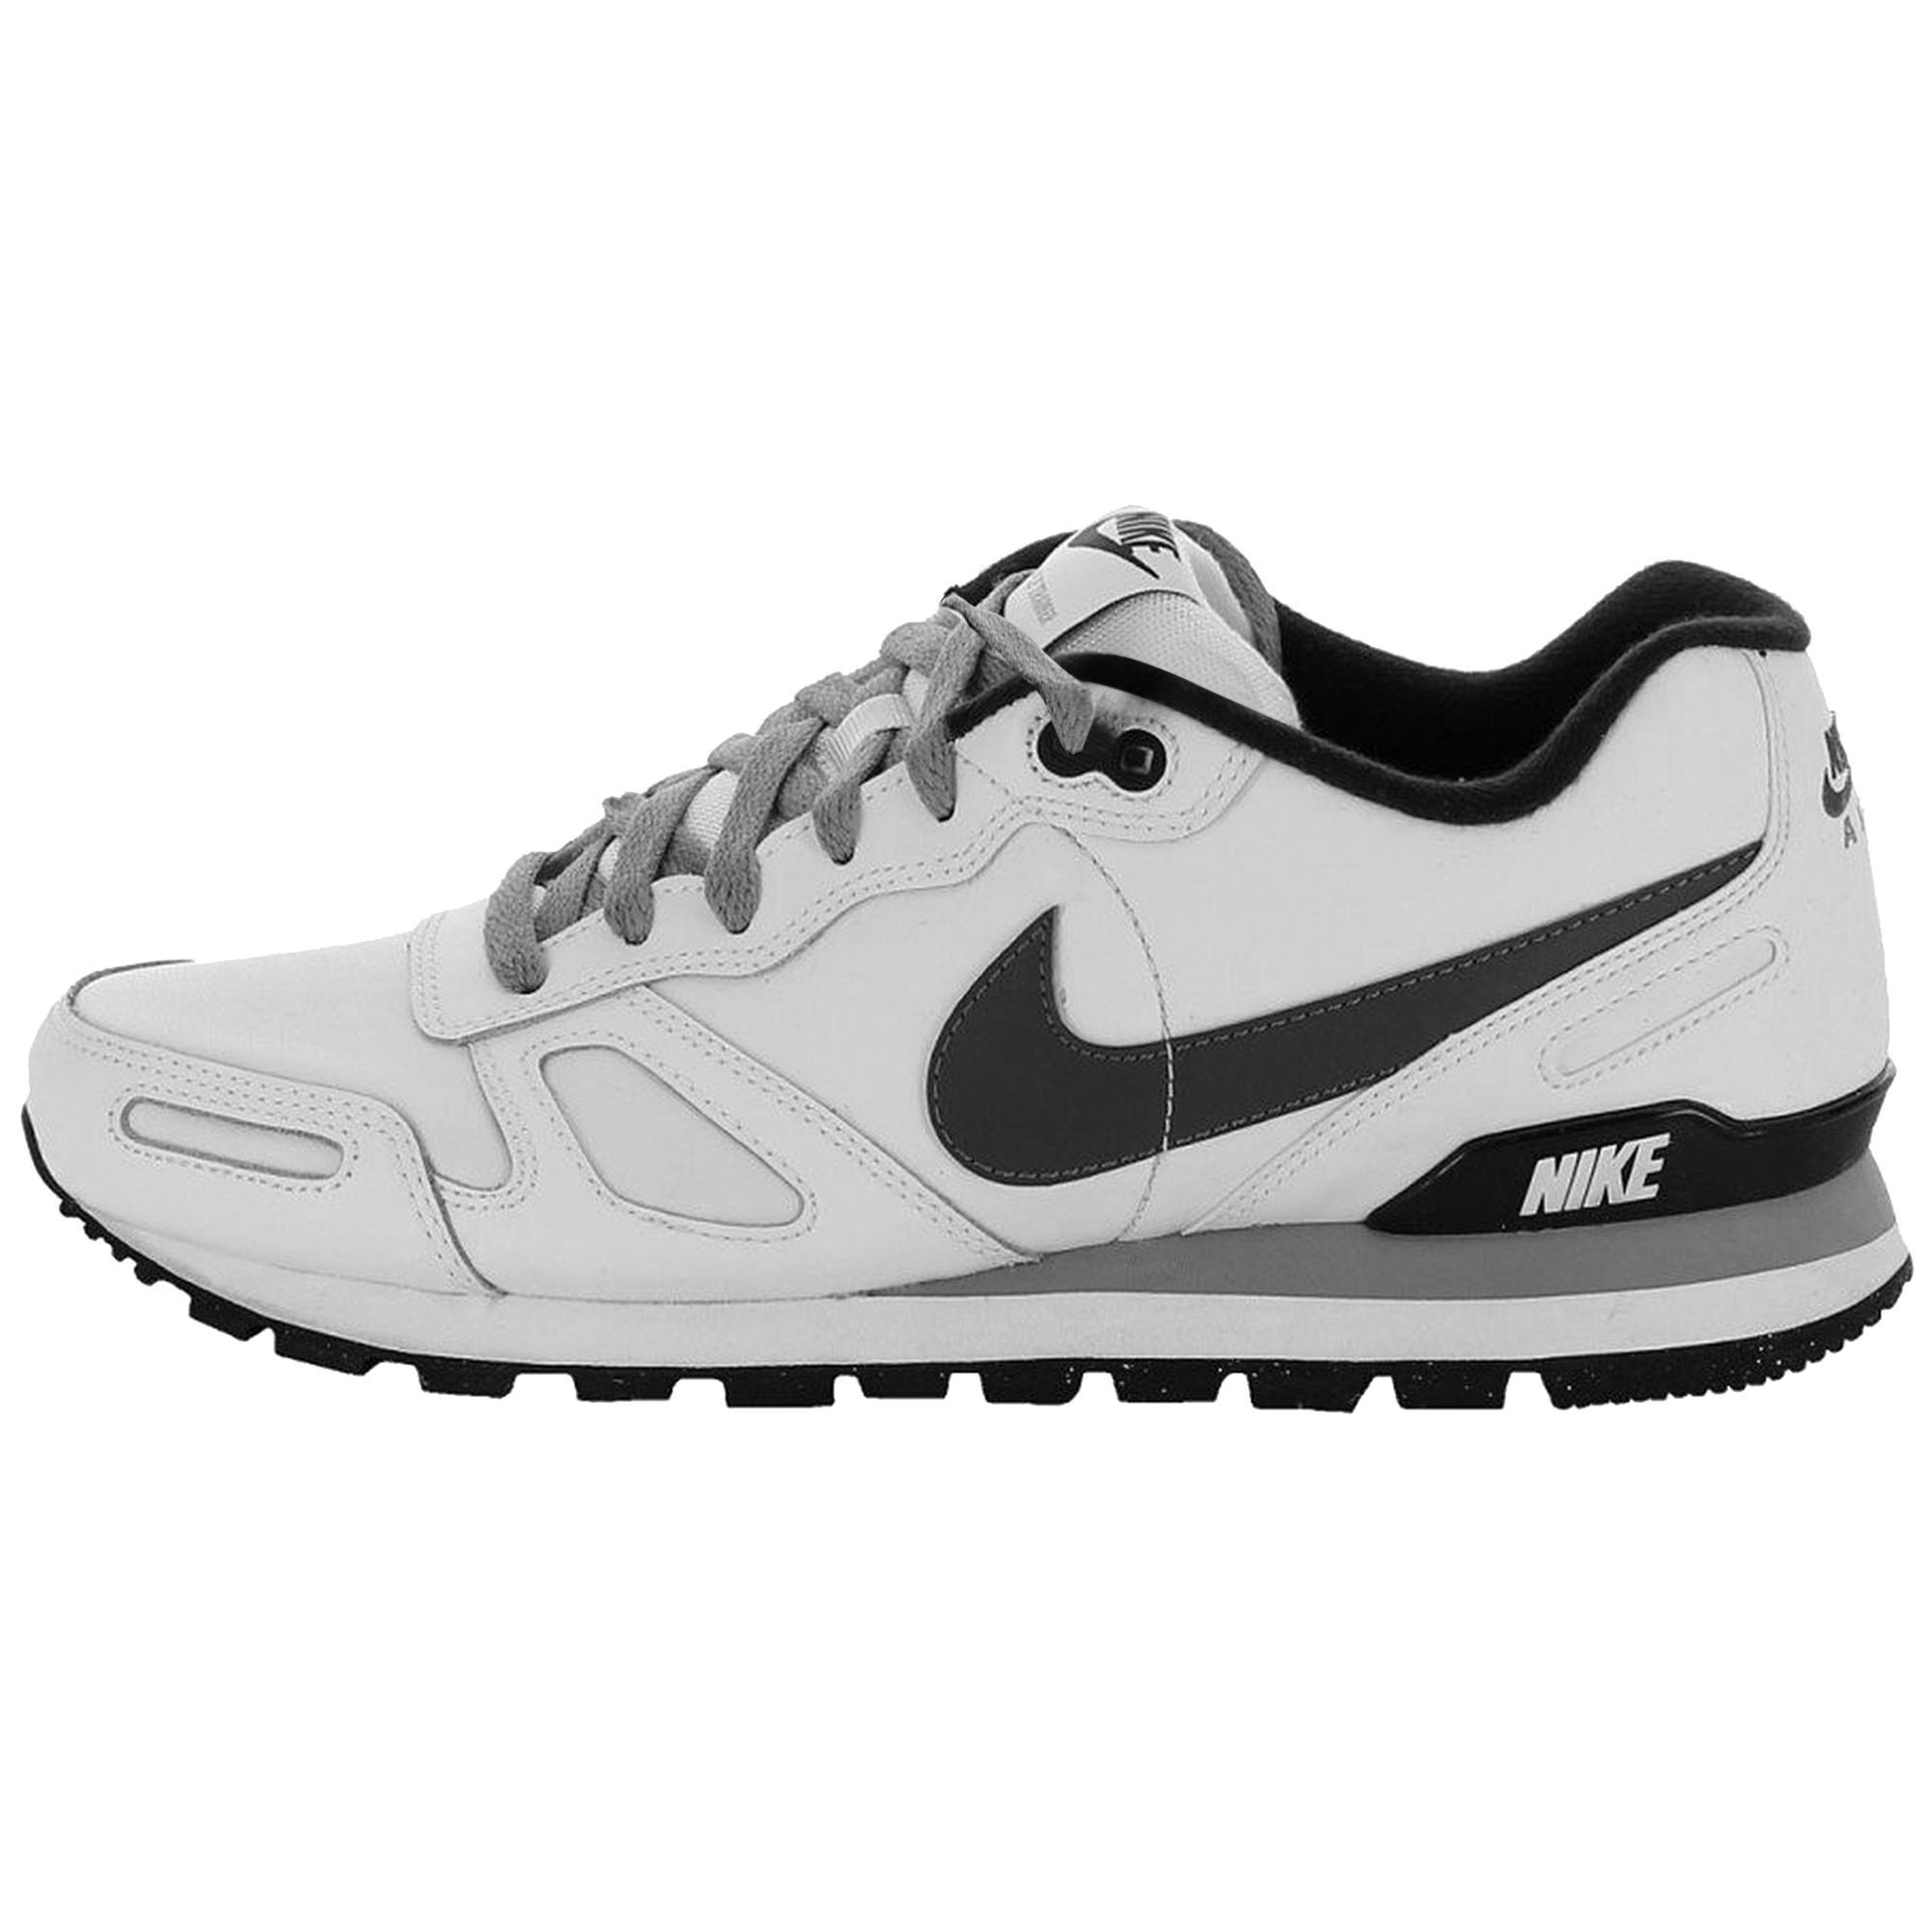 promo code c46f3 42225 Nike Air Waffle Trainer Leather FW11 Erkek Spor Ayakkabı #454395-100 ...